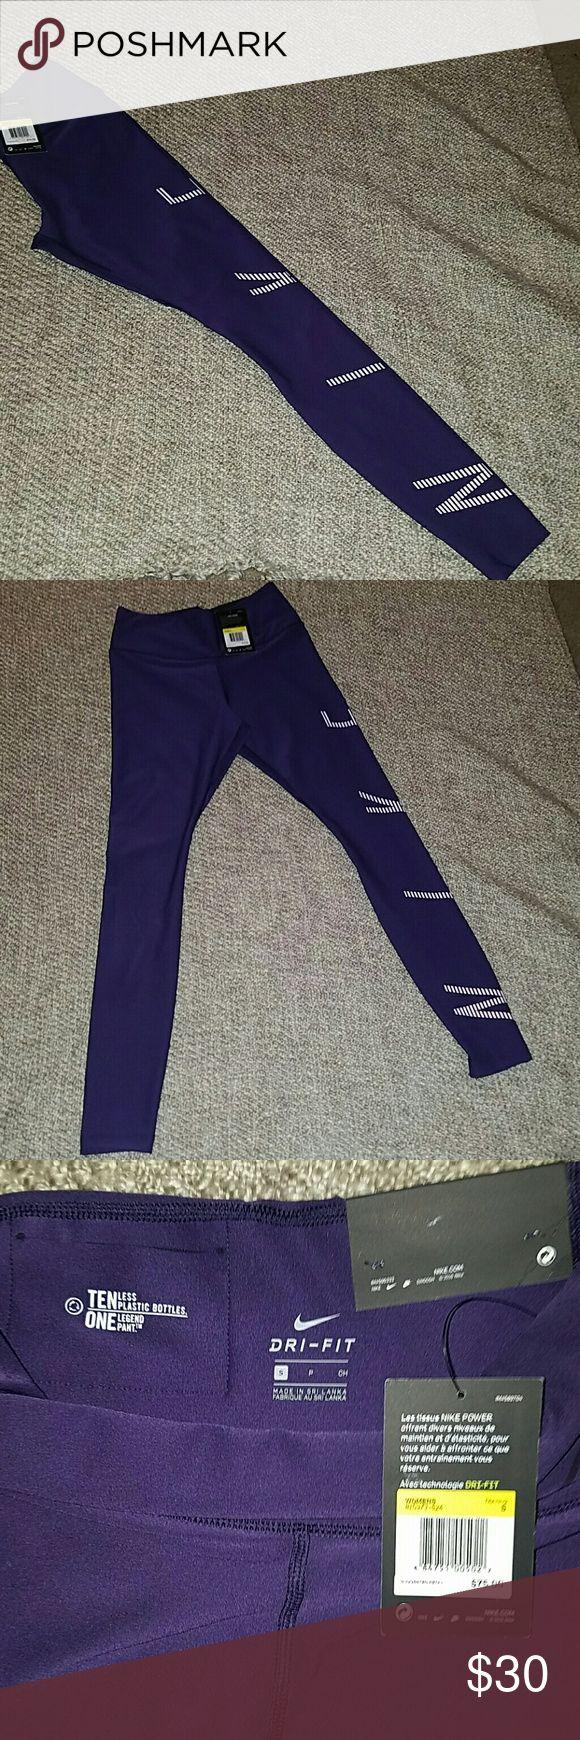 NWT Nike leggings. Dark purple Nike leggings with Nike name in white down left leg. Nike Pants Leggings